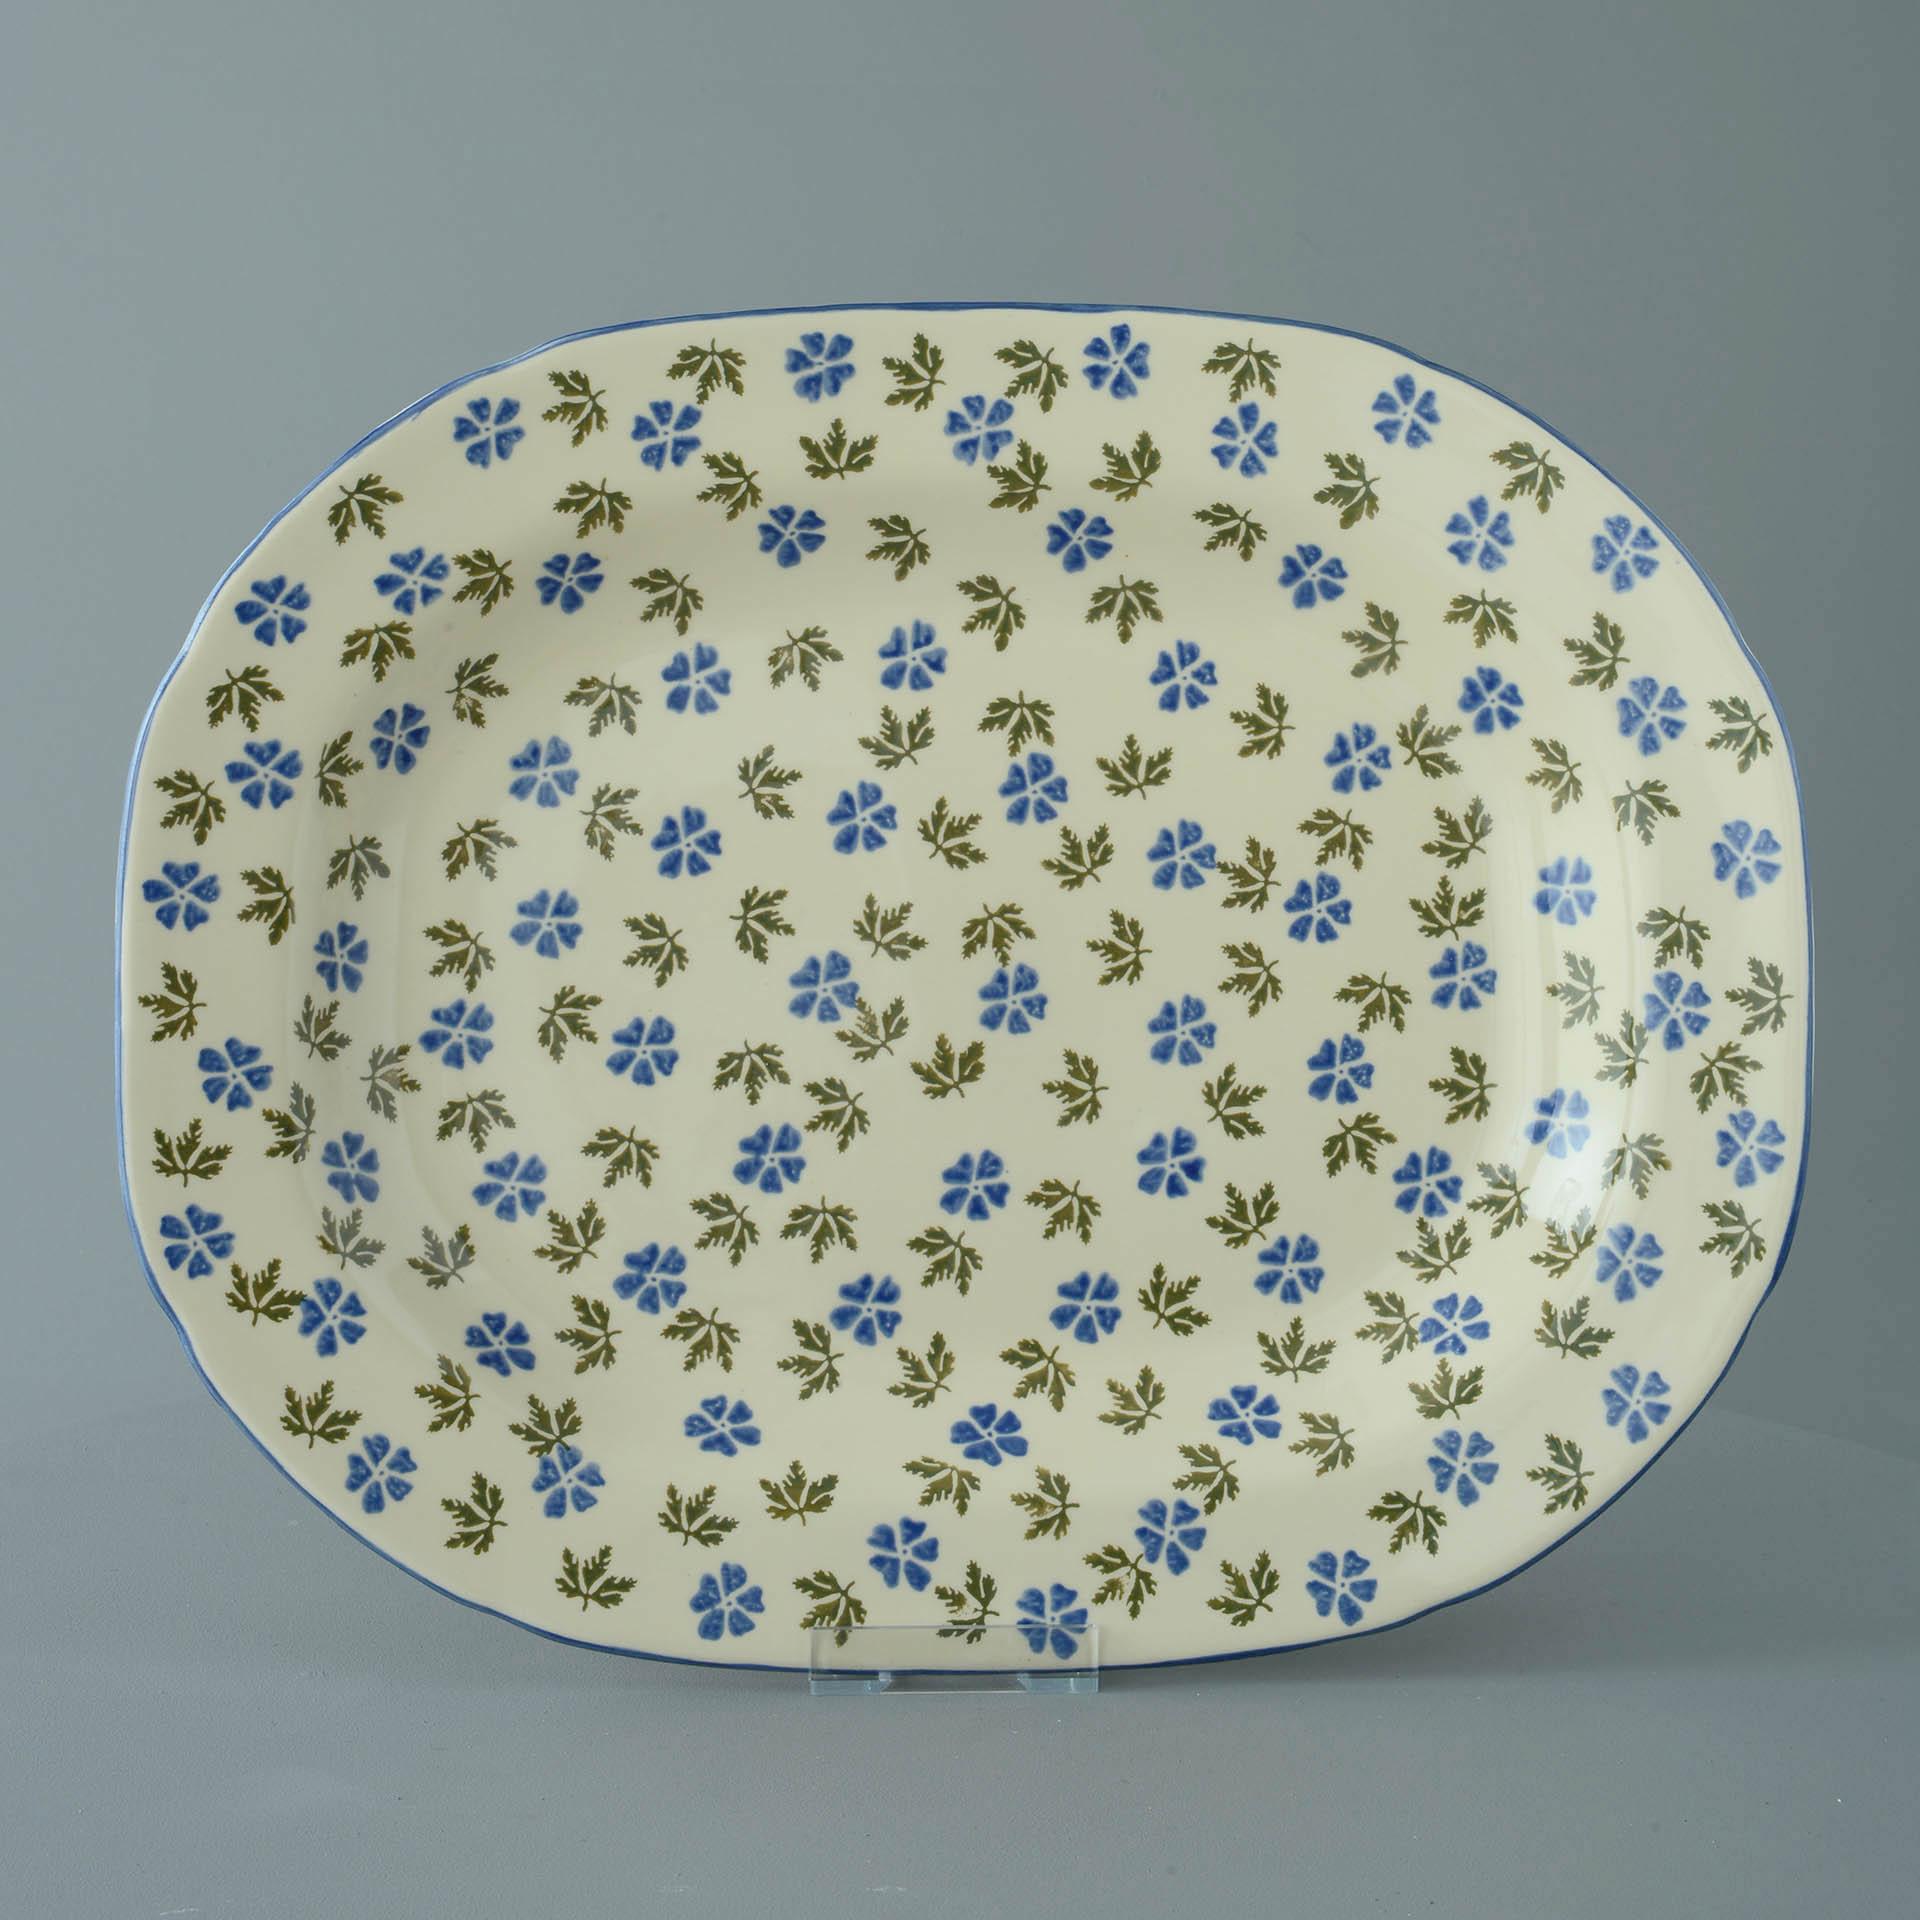 Geranium Serving Plate Rectangular 45 x 35 x 4.5 cm